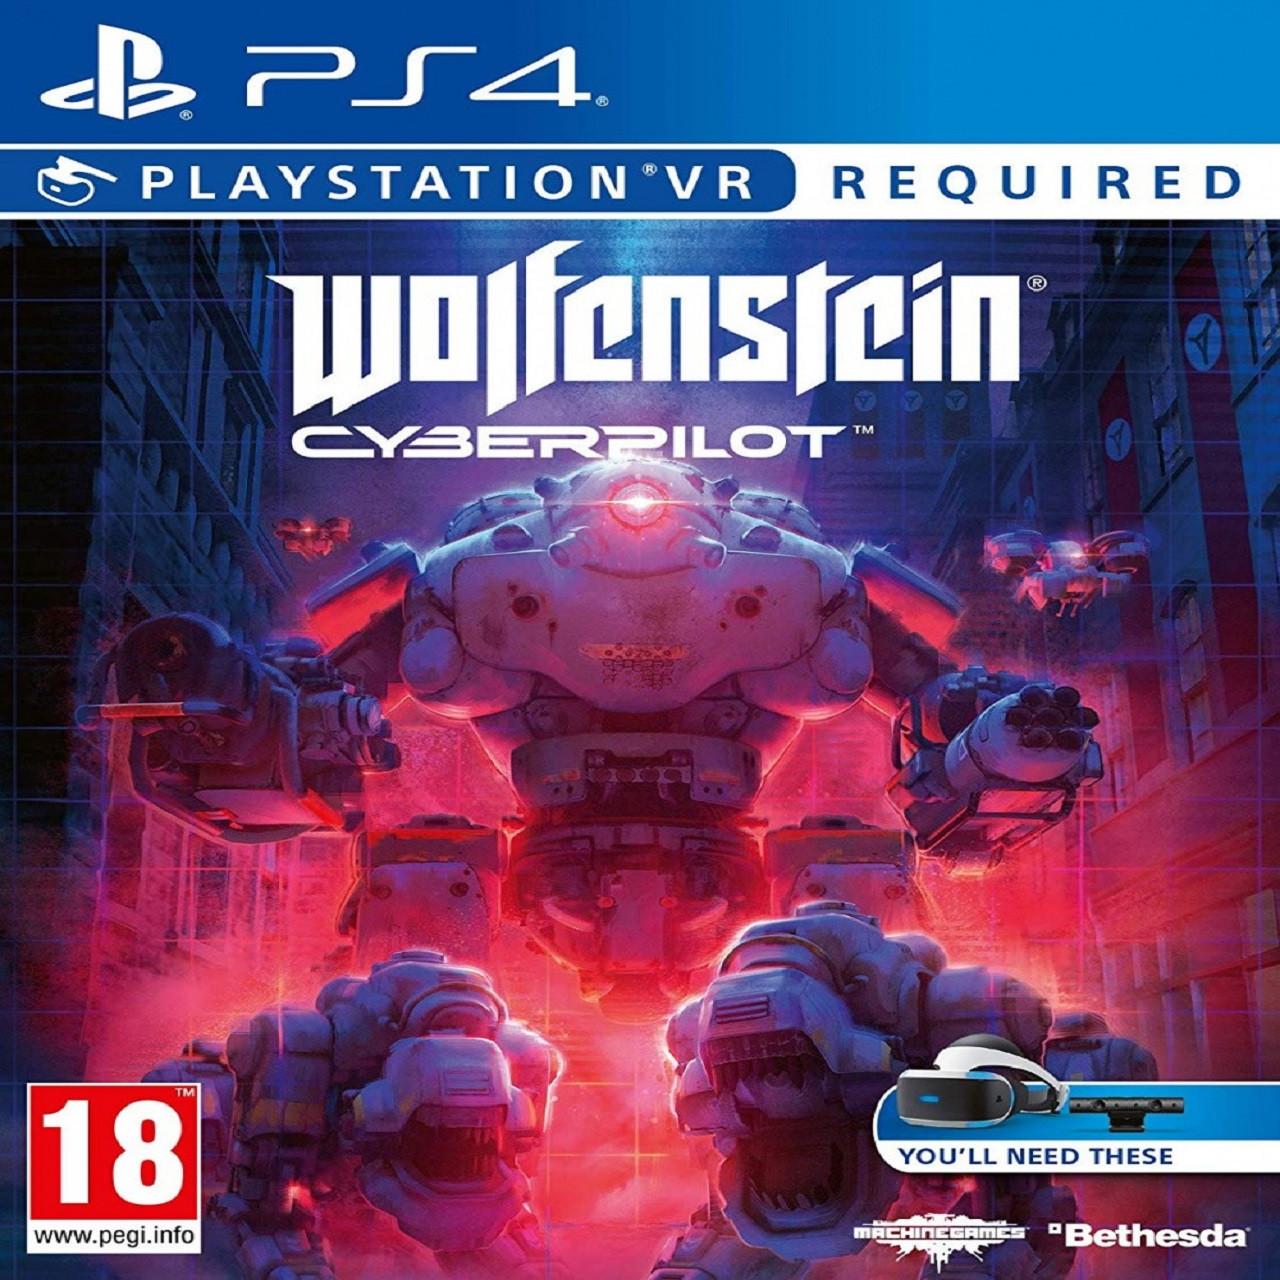 Wolfenstein Cyberpilot VR (російська версія) PS4